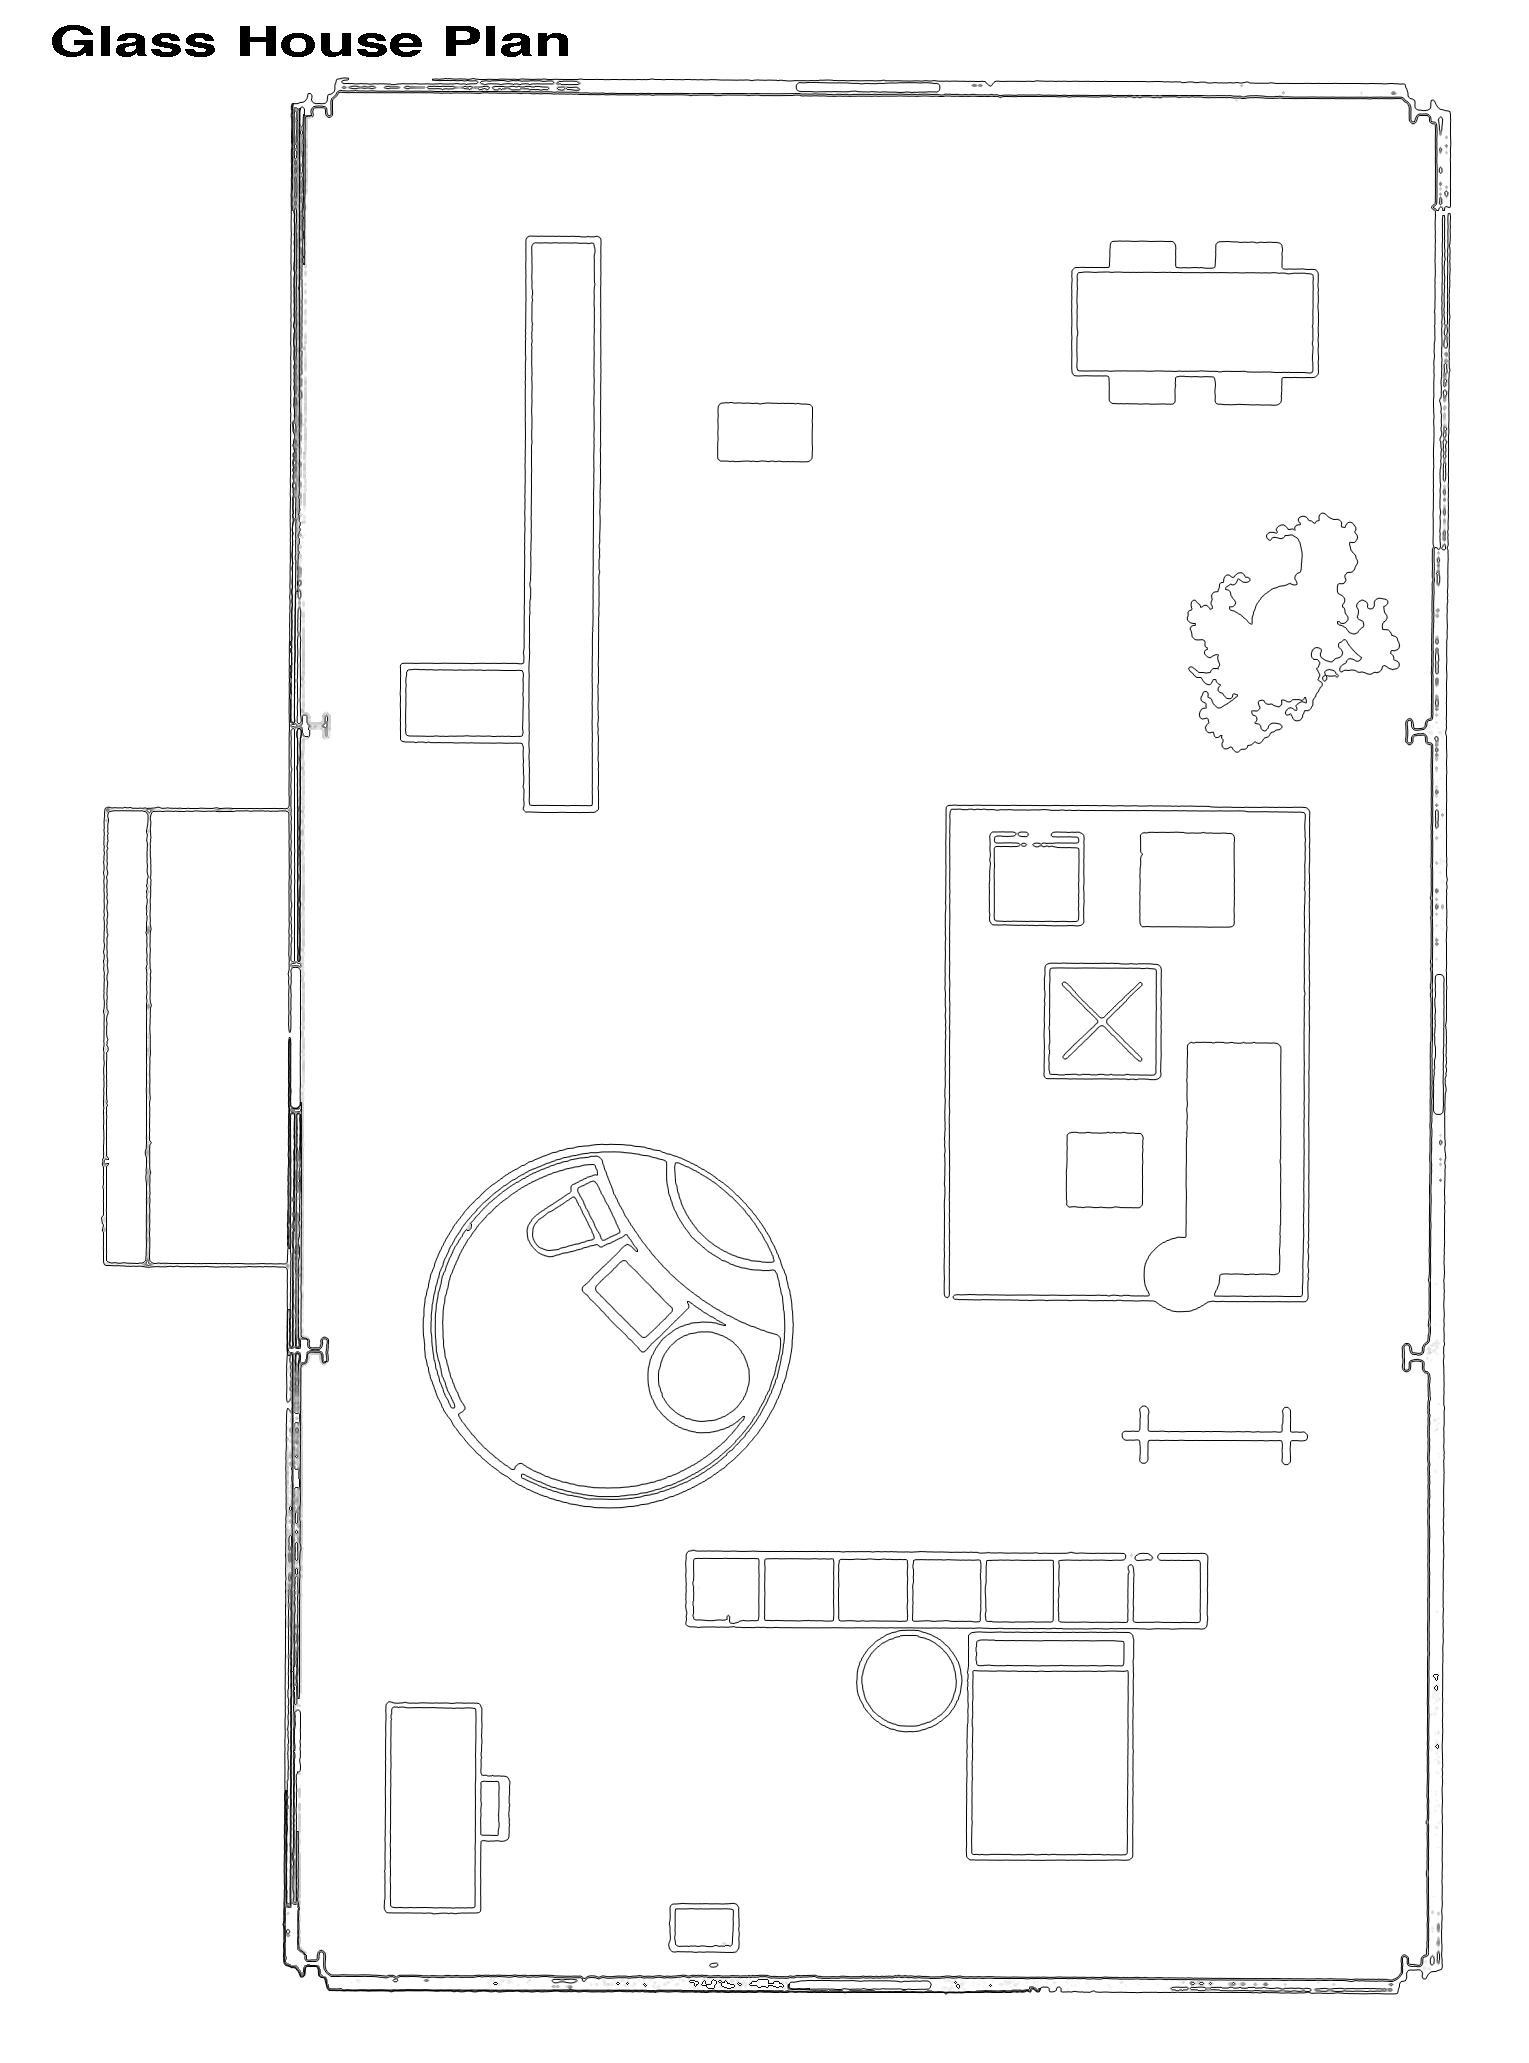 Glass House plan.jpg